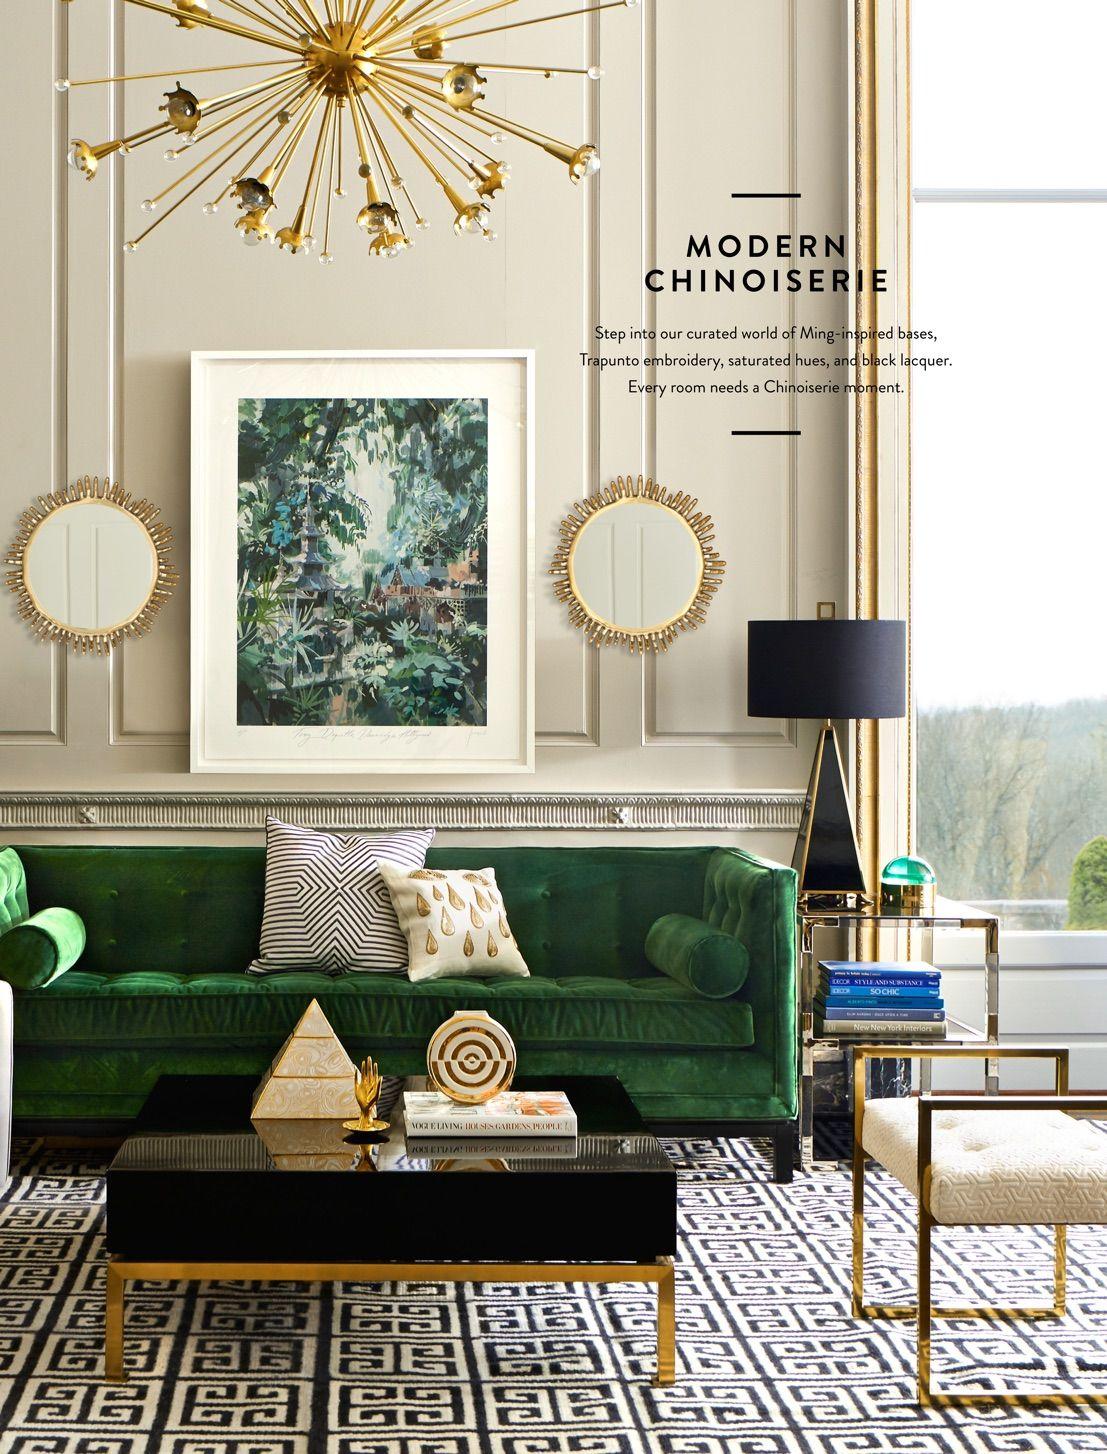 Interior Design Living Rooms Photos: Pin By Caitlin Christianson On Decor Inspiration